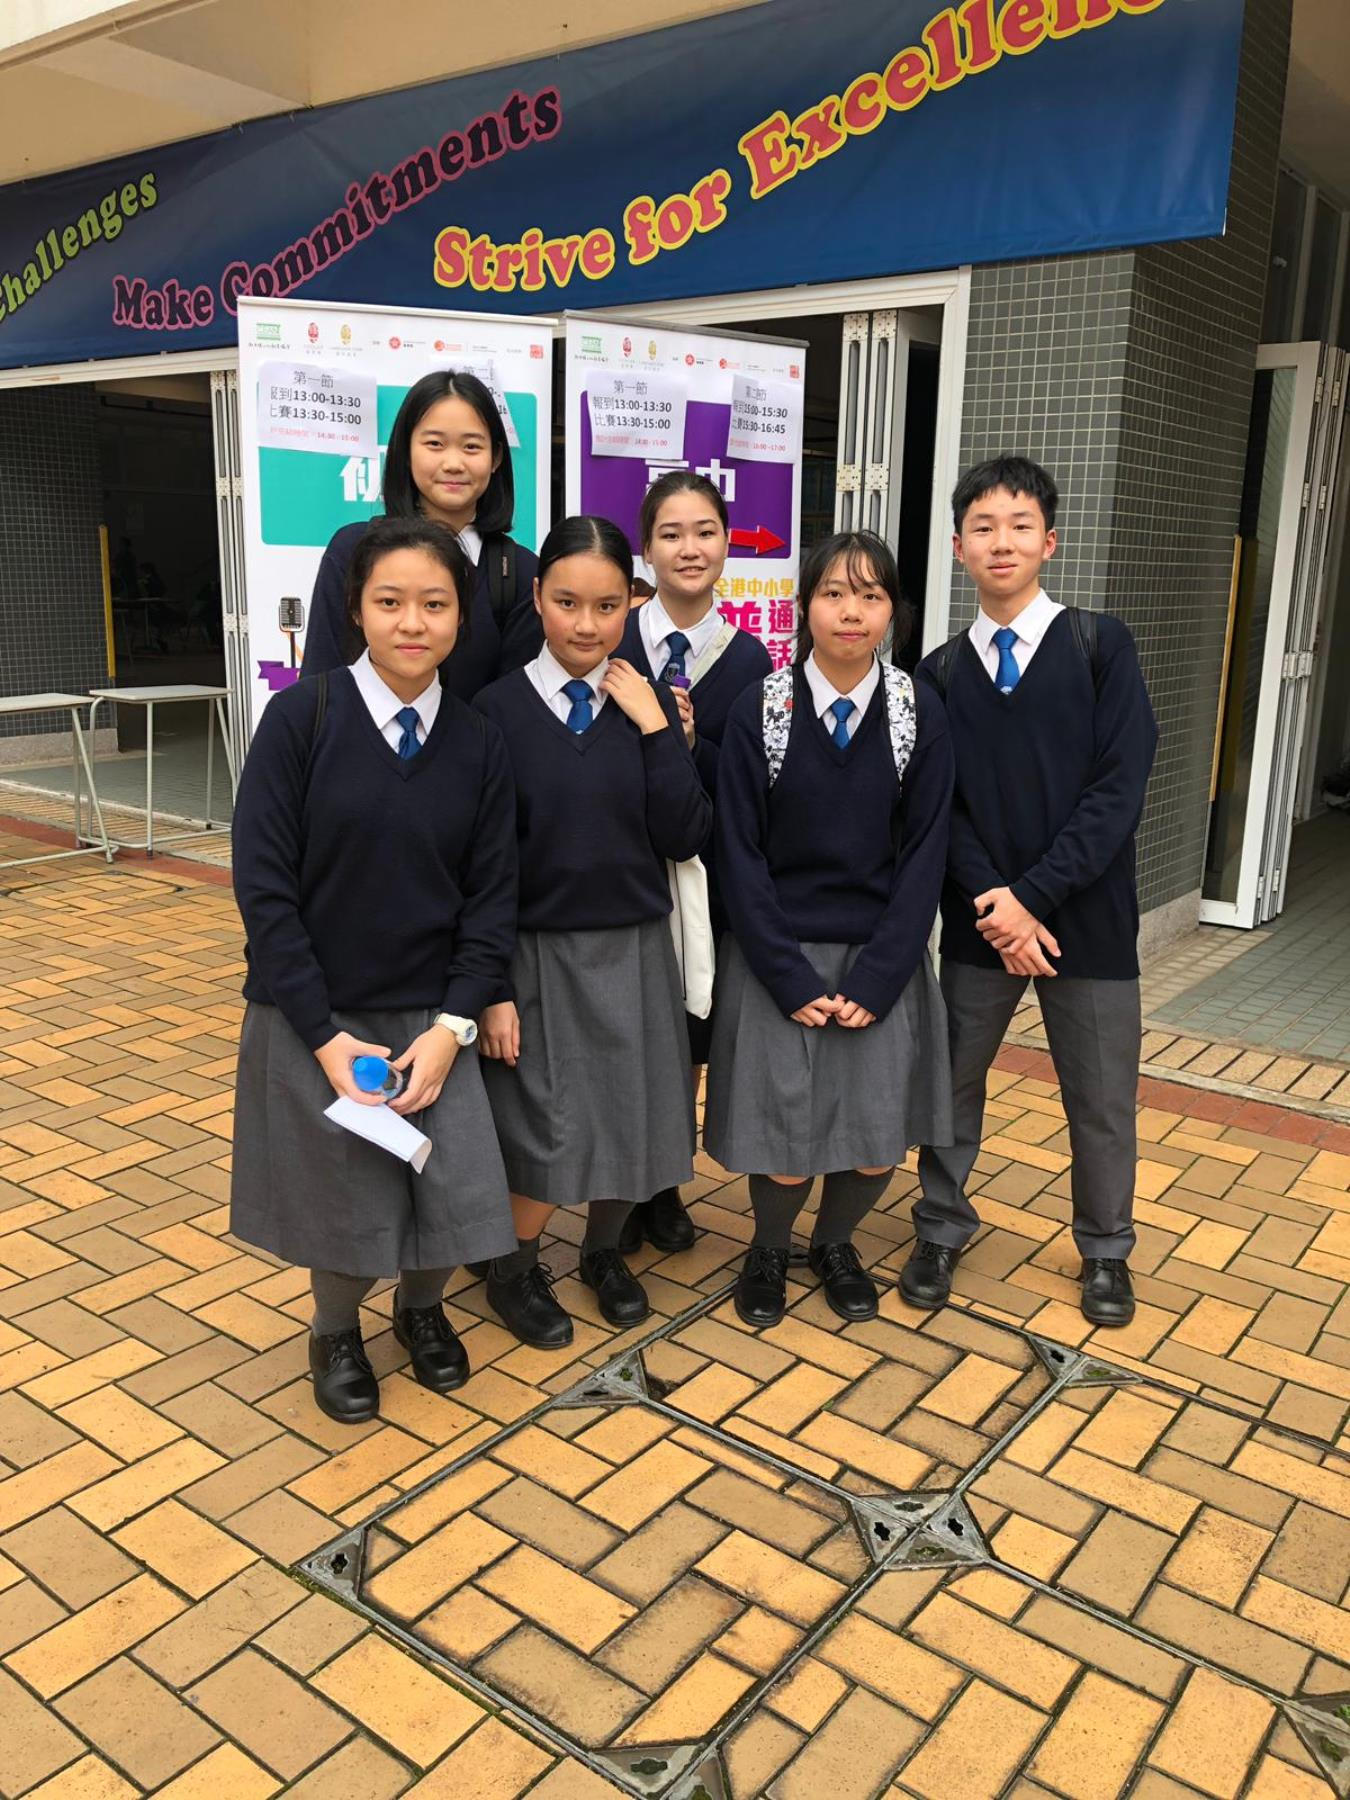 http://npc.edu.hk/sites/default/files/igtl2203.jpg